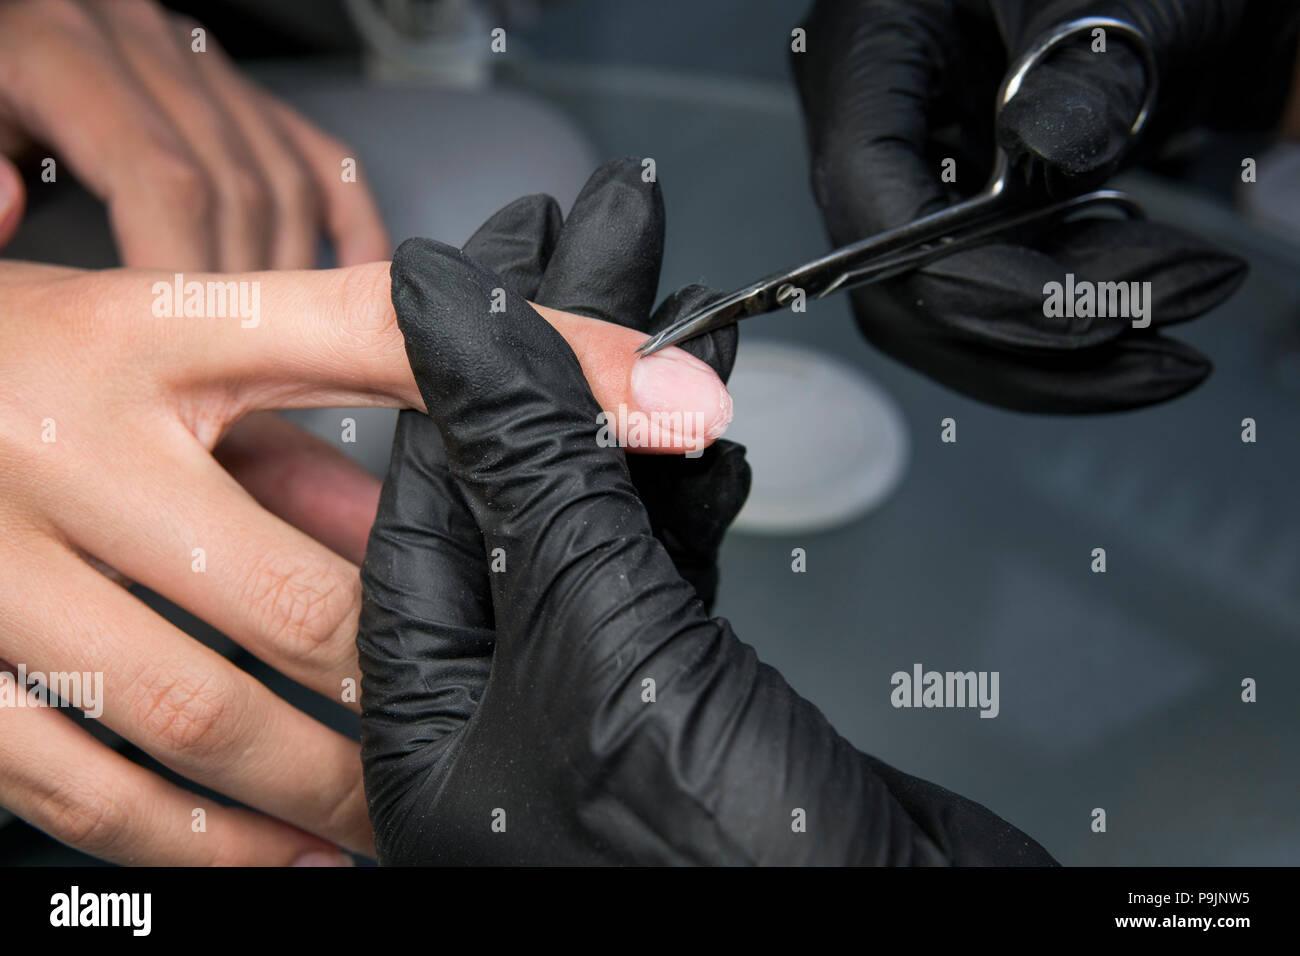 Nail Spa Stock Photos & Nail Spa Stock Images - Alamy